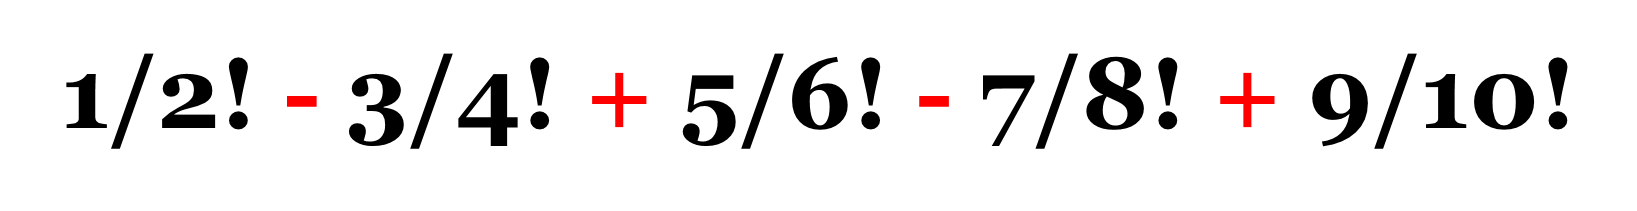 algoritmo pseint fracciones denominador factorial